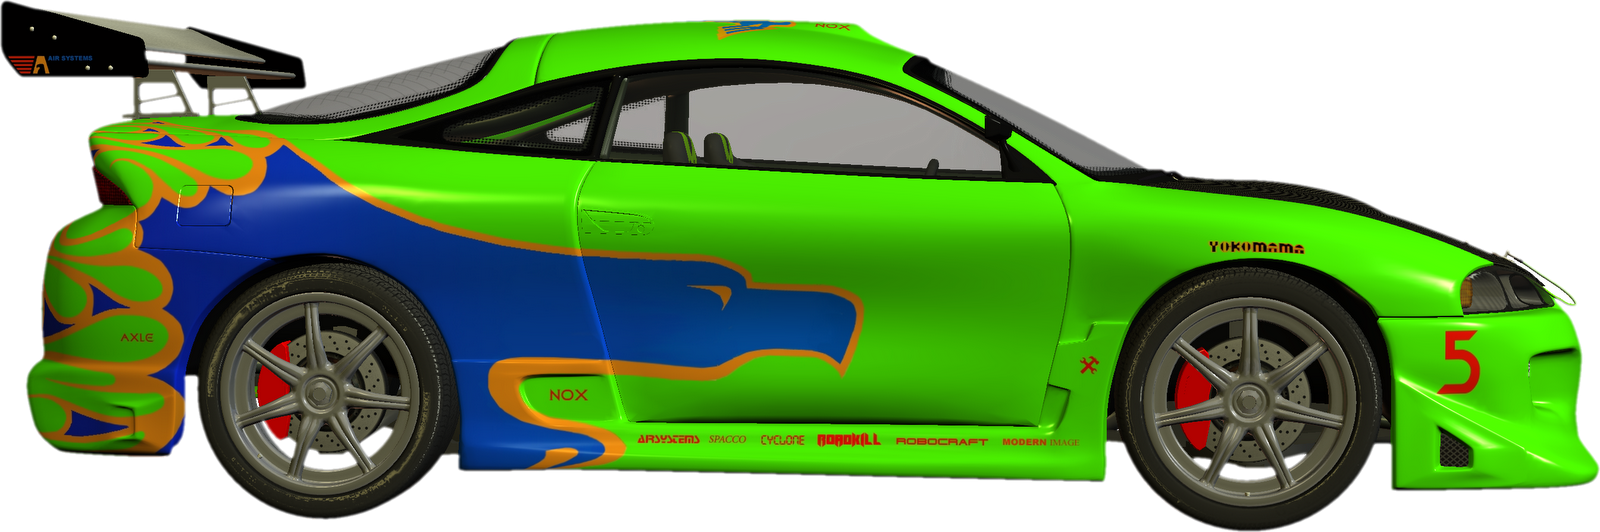 Clip Art Cars